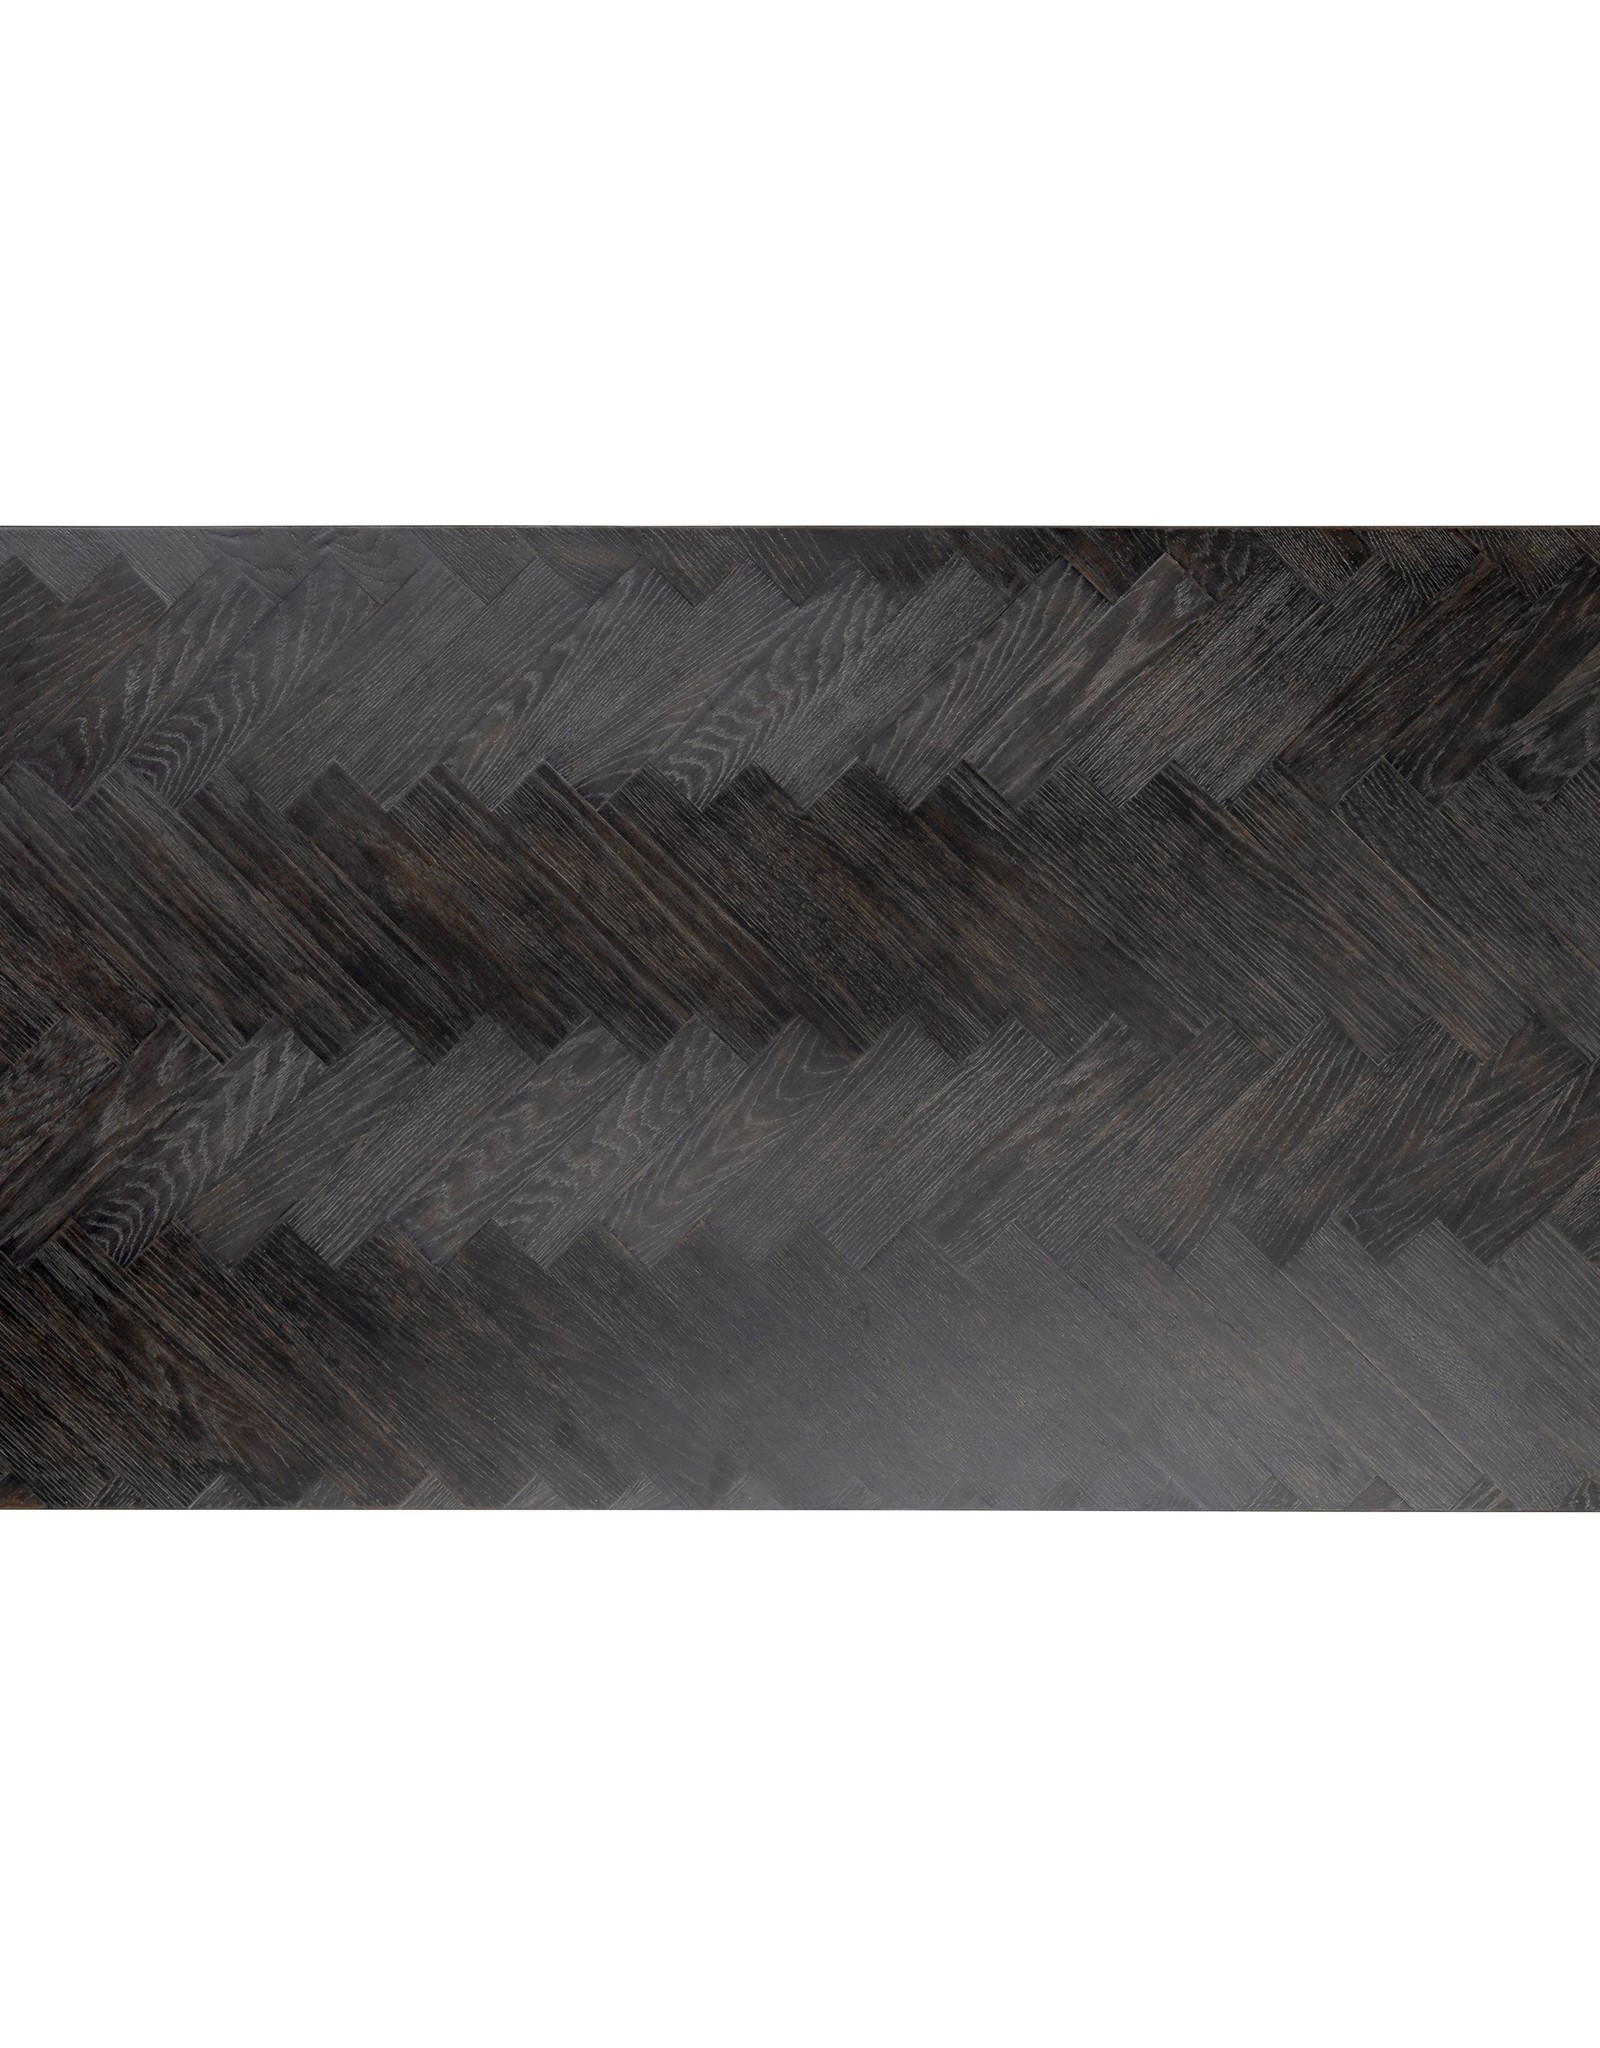 Richmond Interiors Salontafel Blackbone silver 150x80 (Block)